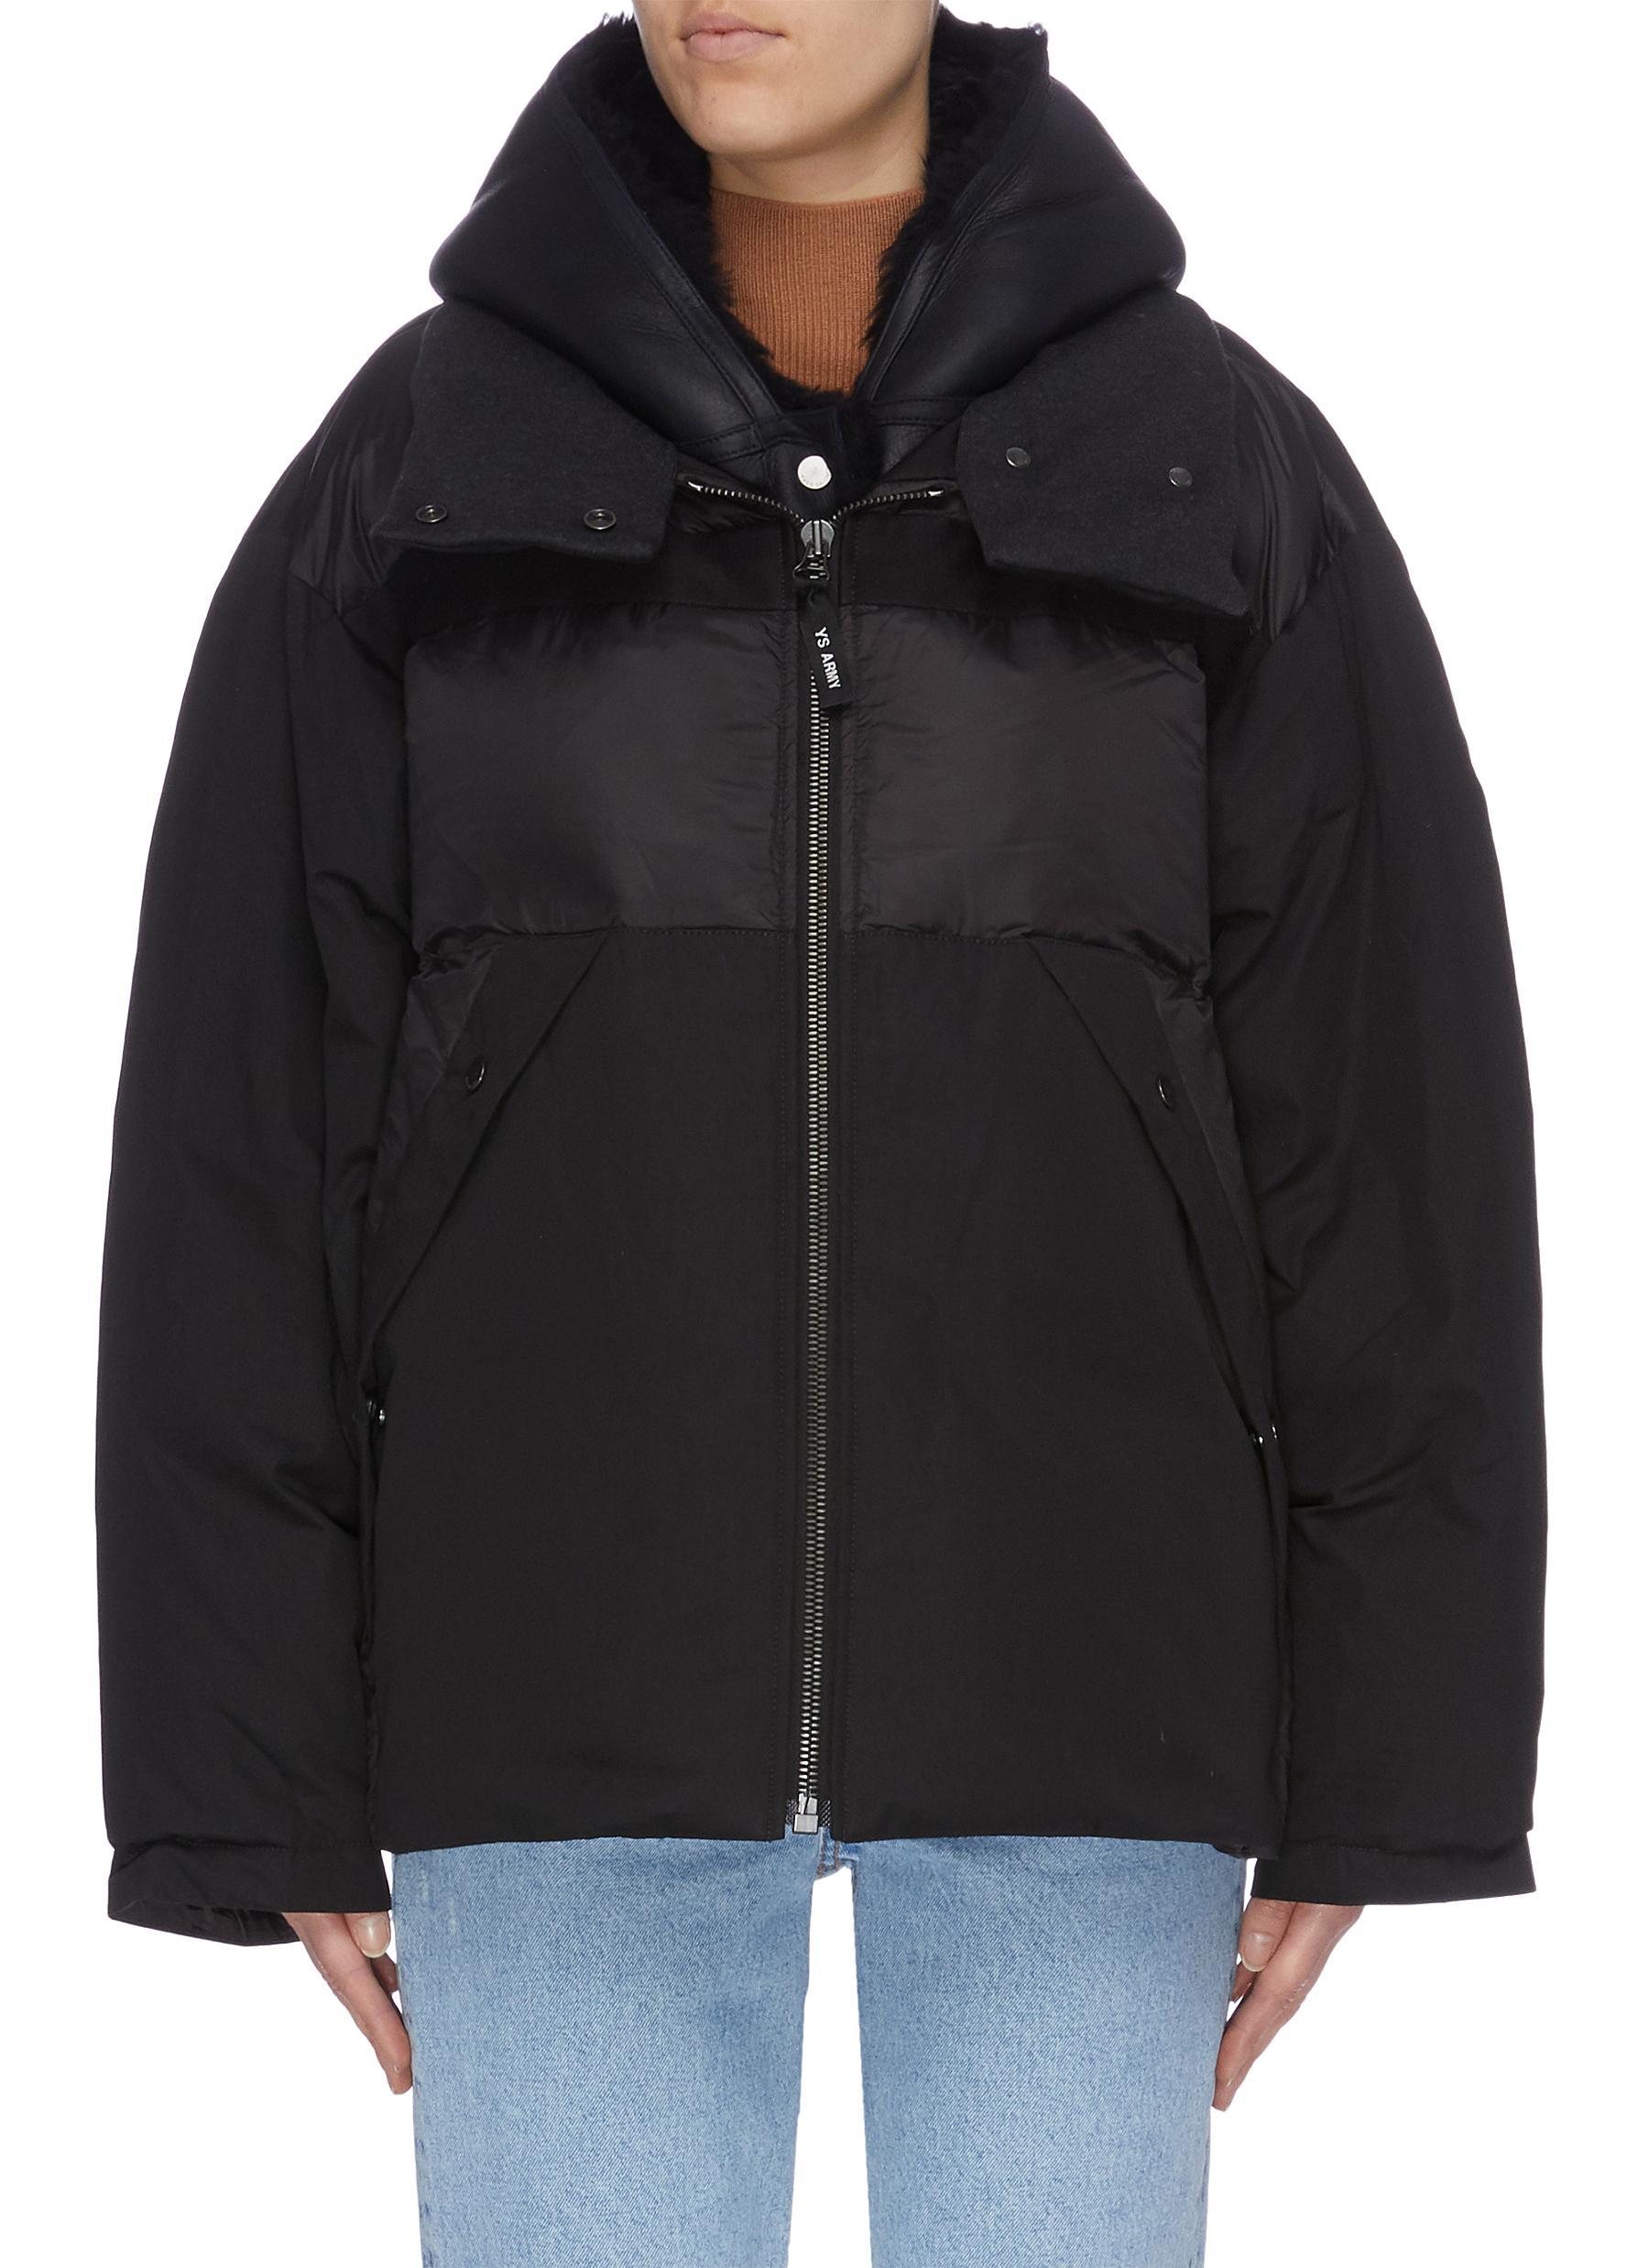 Bachette Merinillo lambskin shearling puffer jacket by Army By Yves Salomon